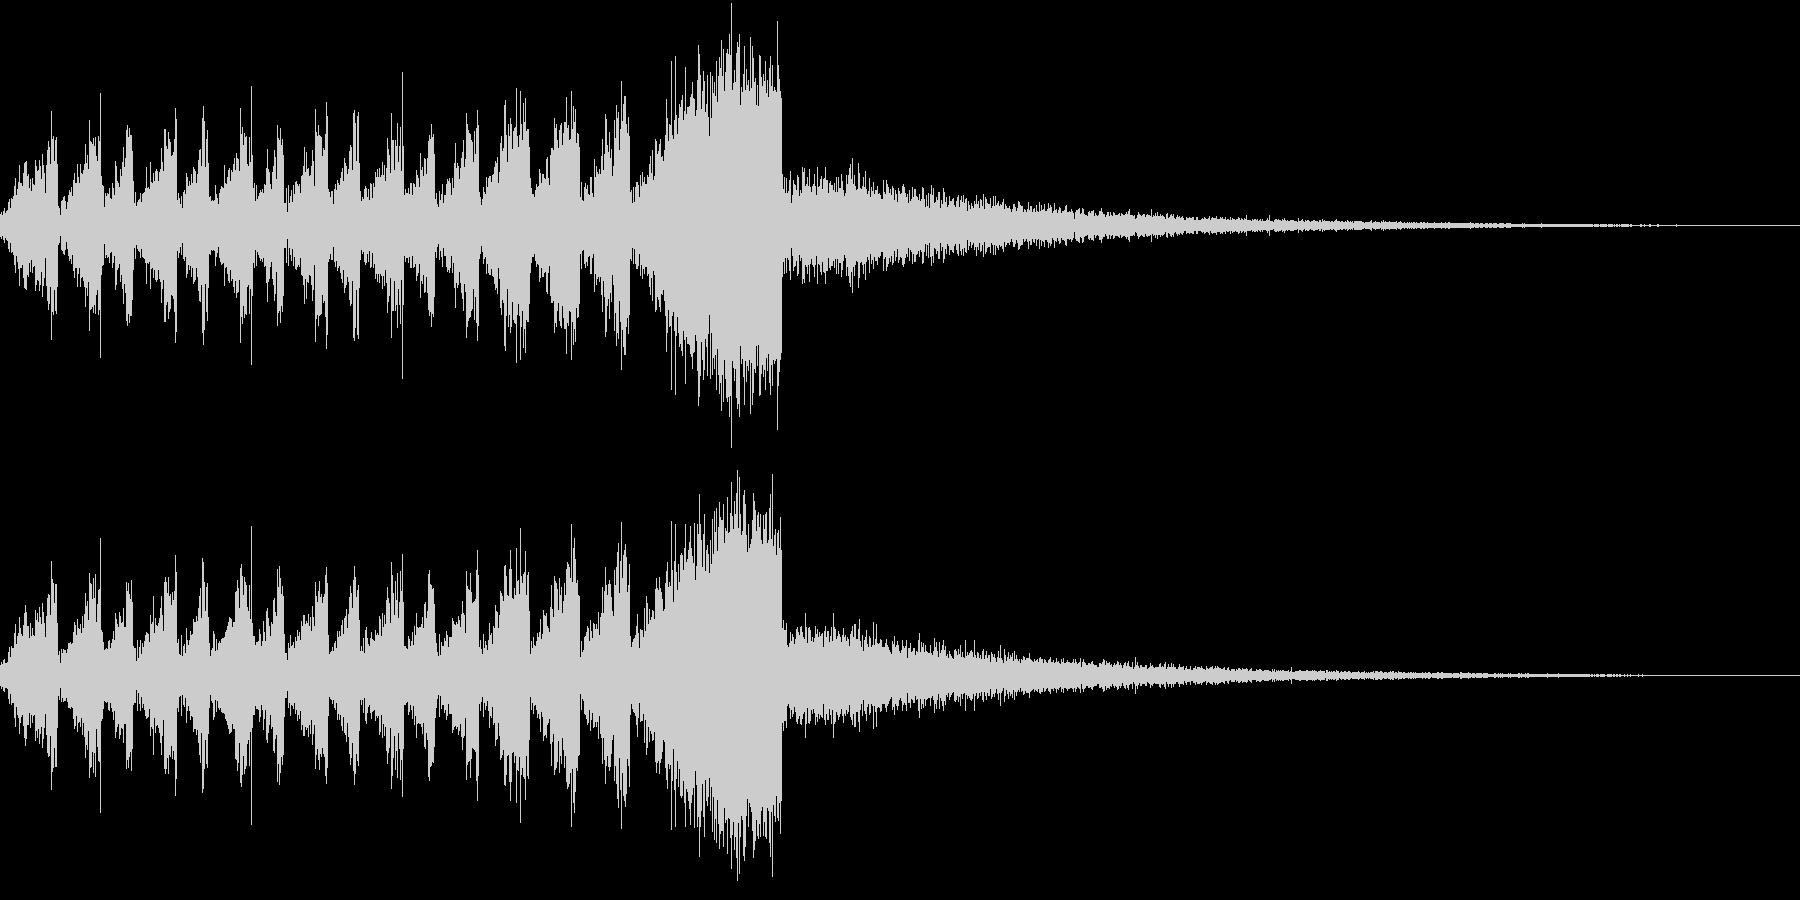 RadioSFX ランキング発表前SEの未再生の波形